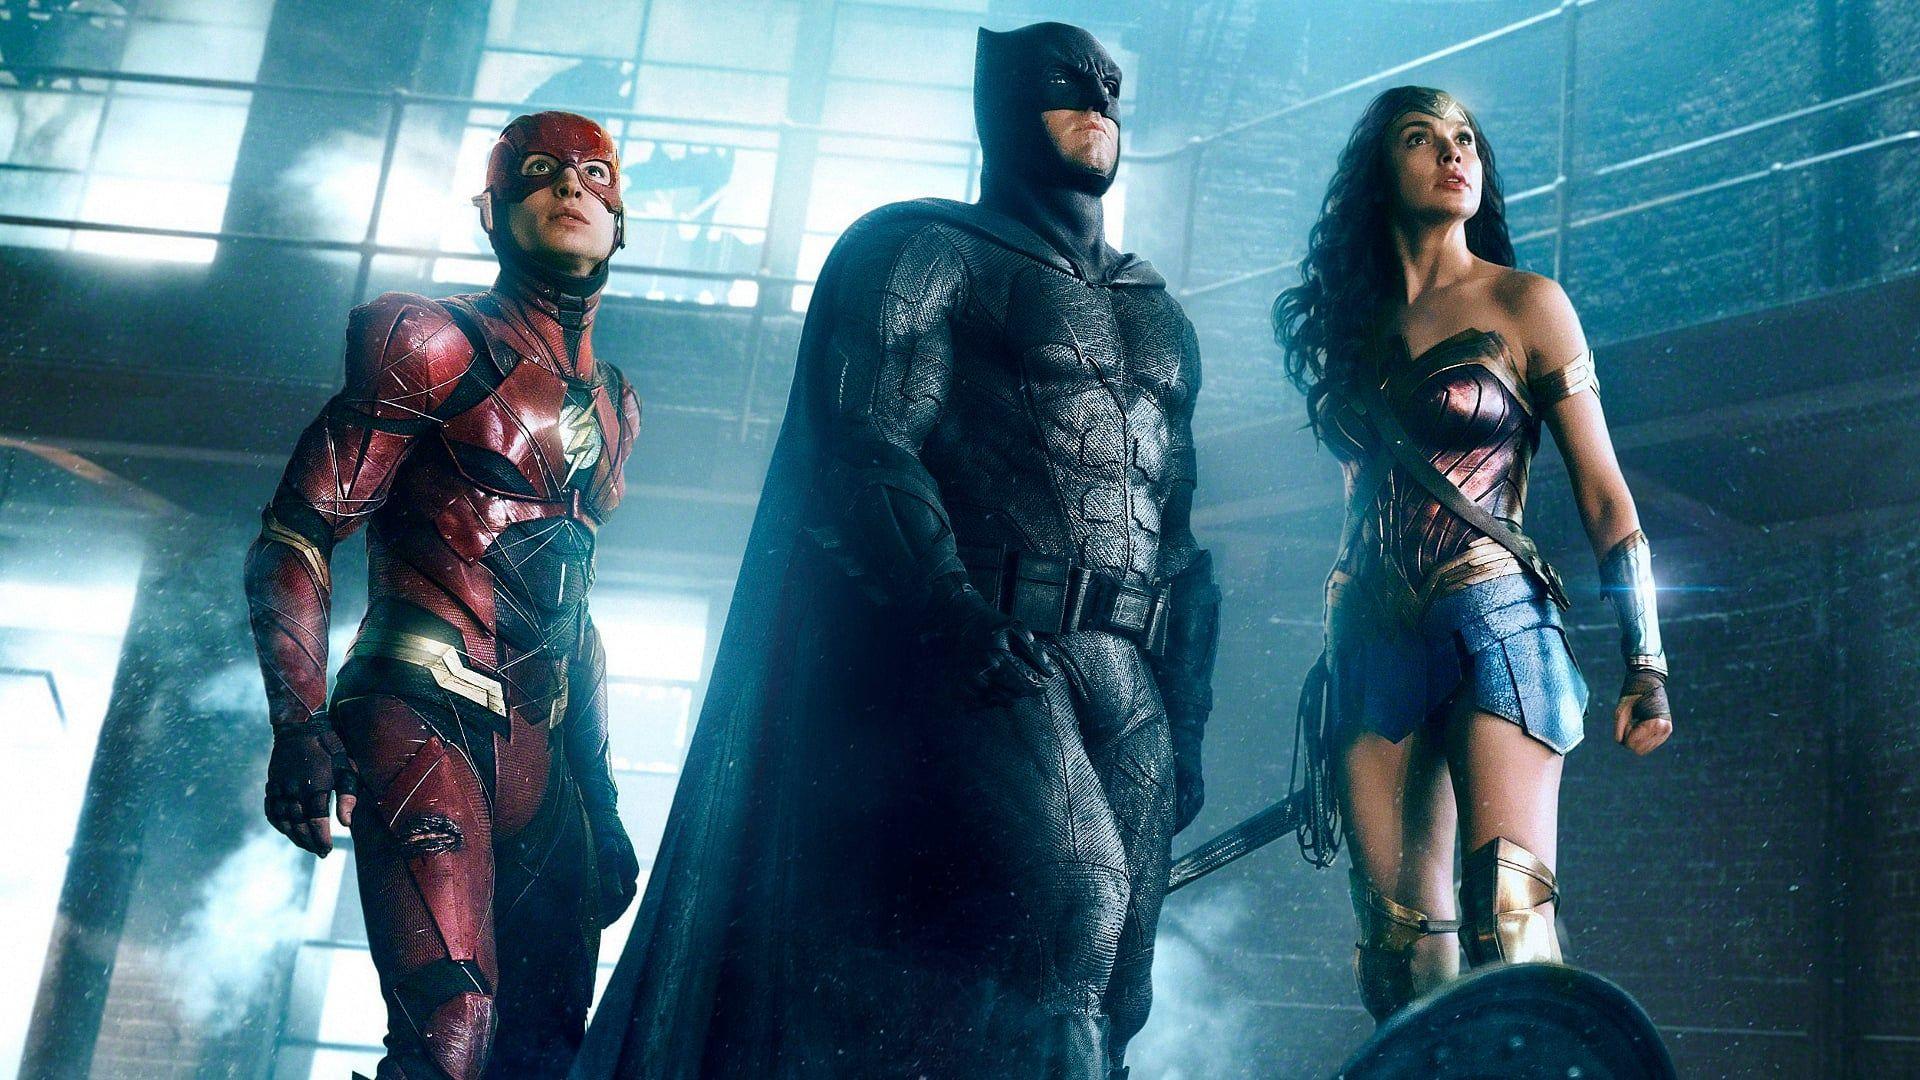 Az Igazsag Ligaja 2017 Online Teljes Film Filmek Magyarul Letoltes Hd Bruce Wayne Tudja Justice League Full Movie Justice League 2017 Justice League Characters